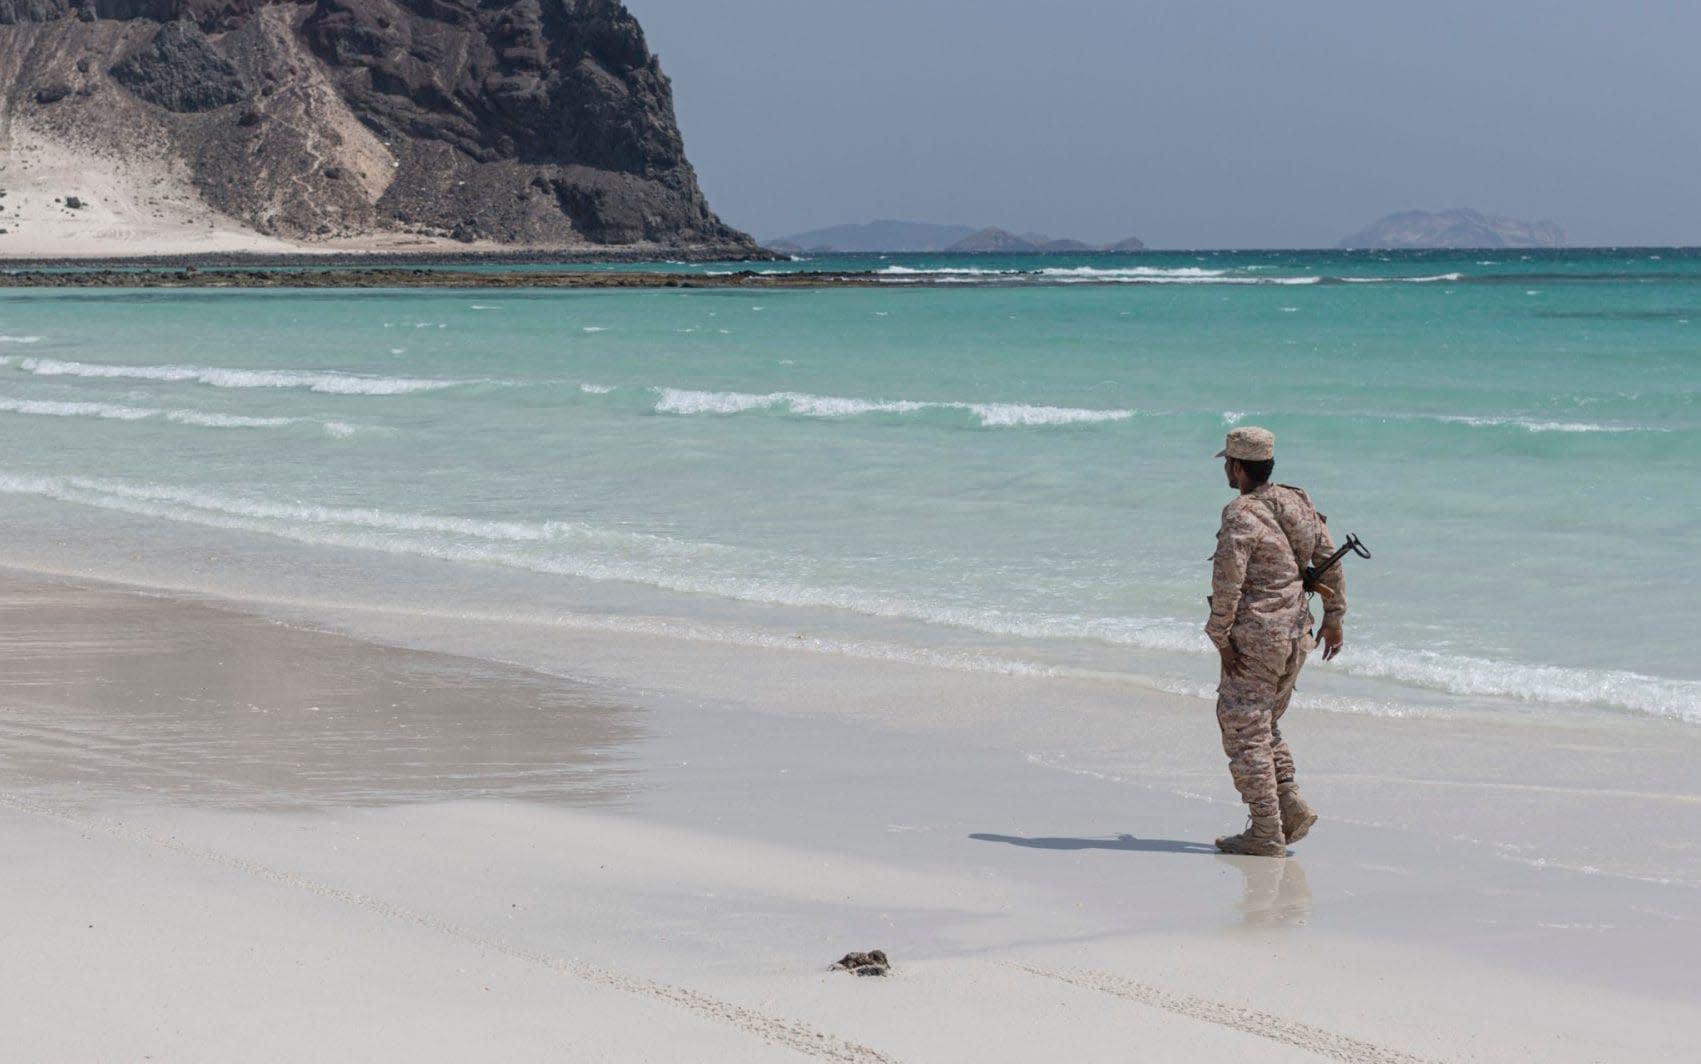 'Welcome to Yemen': Former al-Qaeda haven builds beach resort in hope of attracting tourists despite civil war